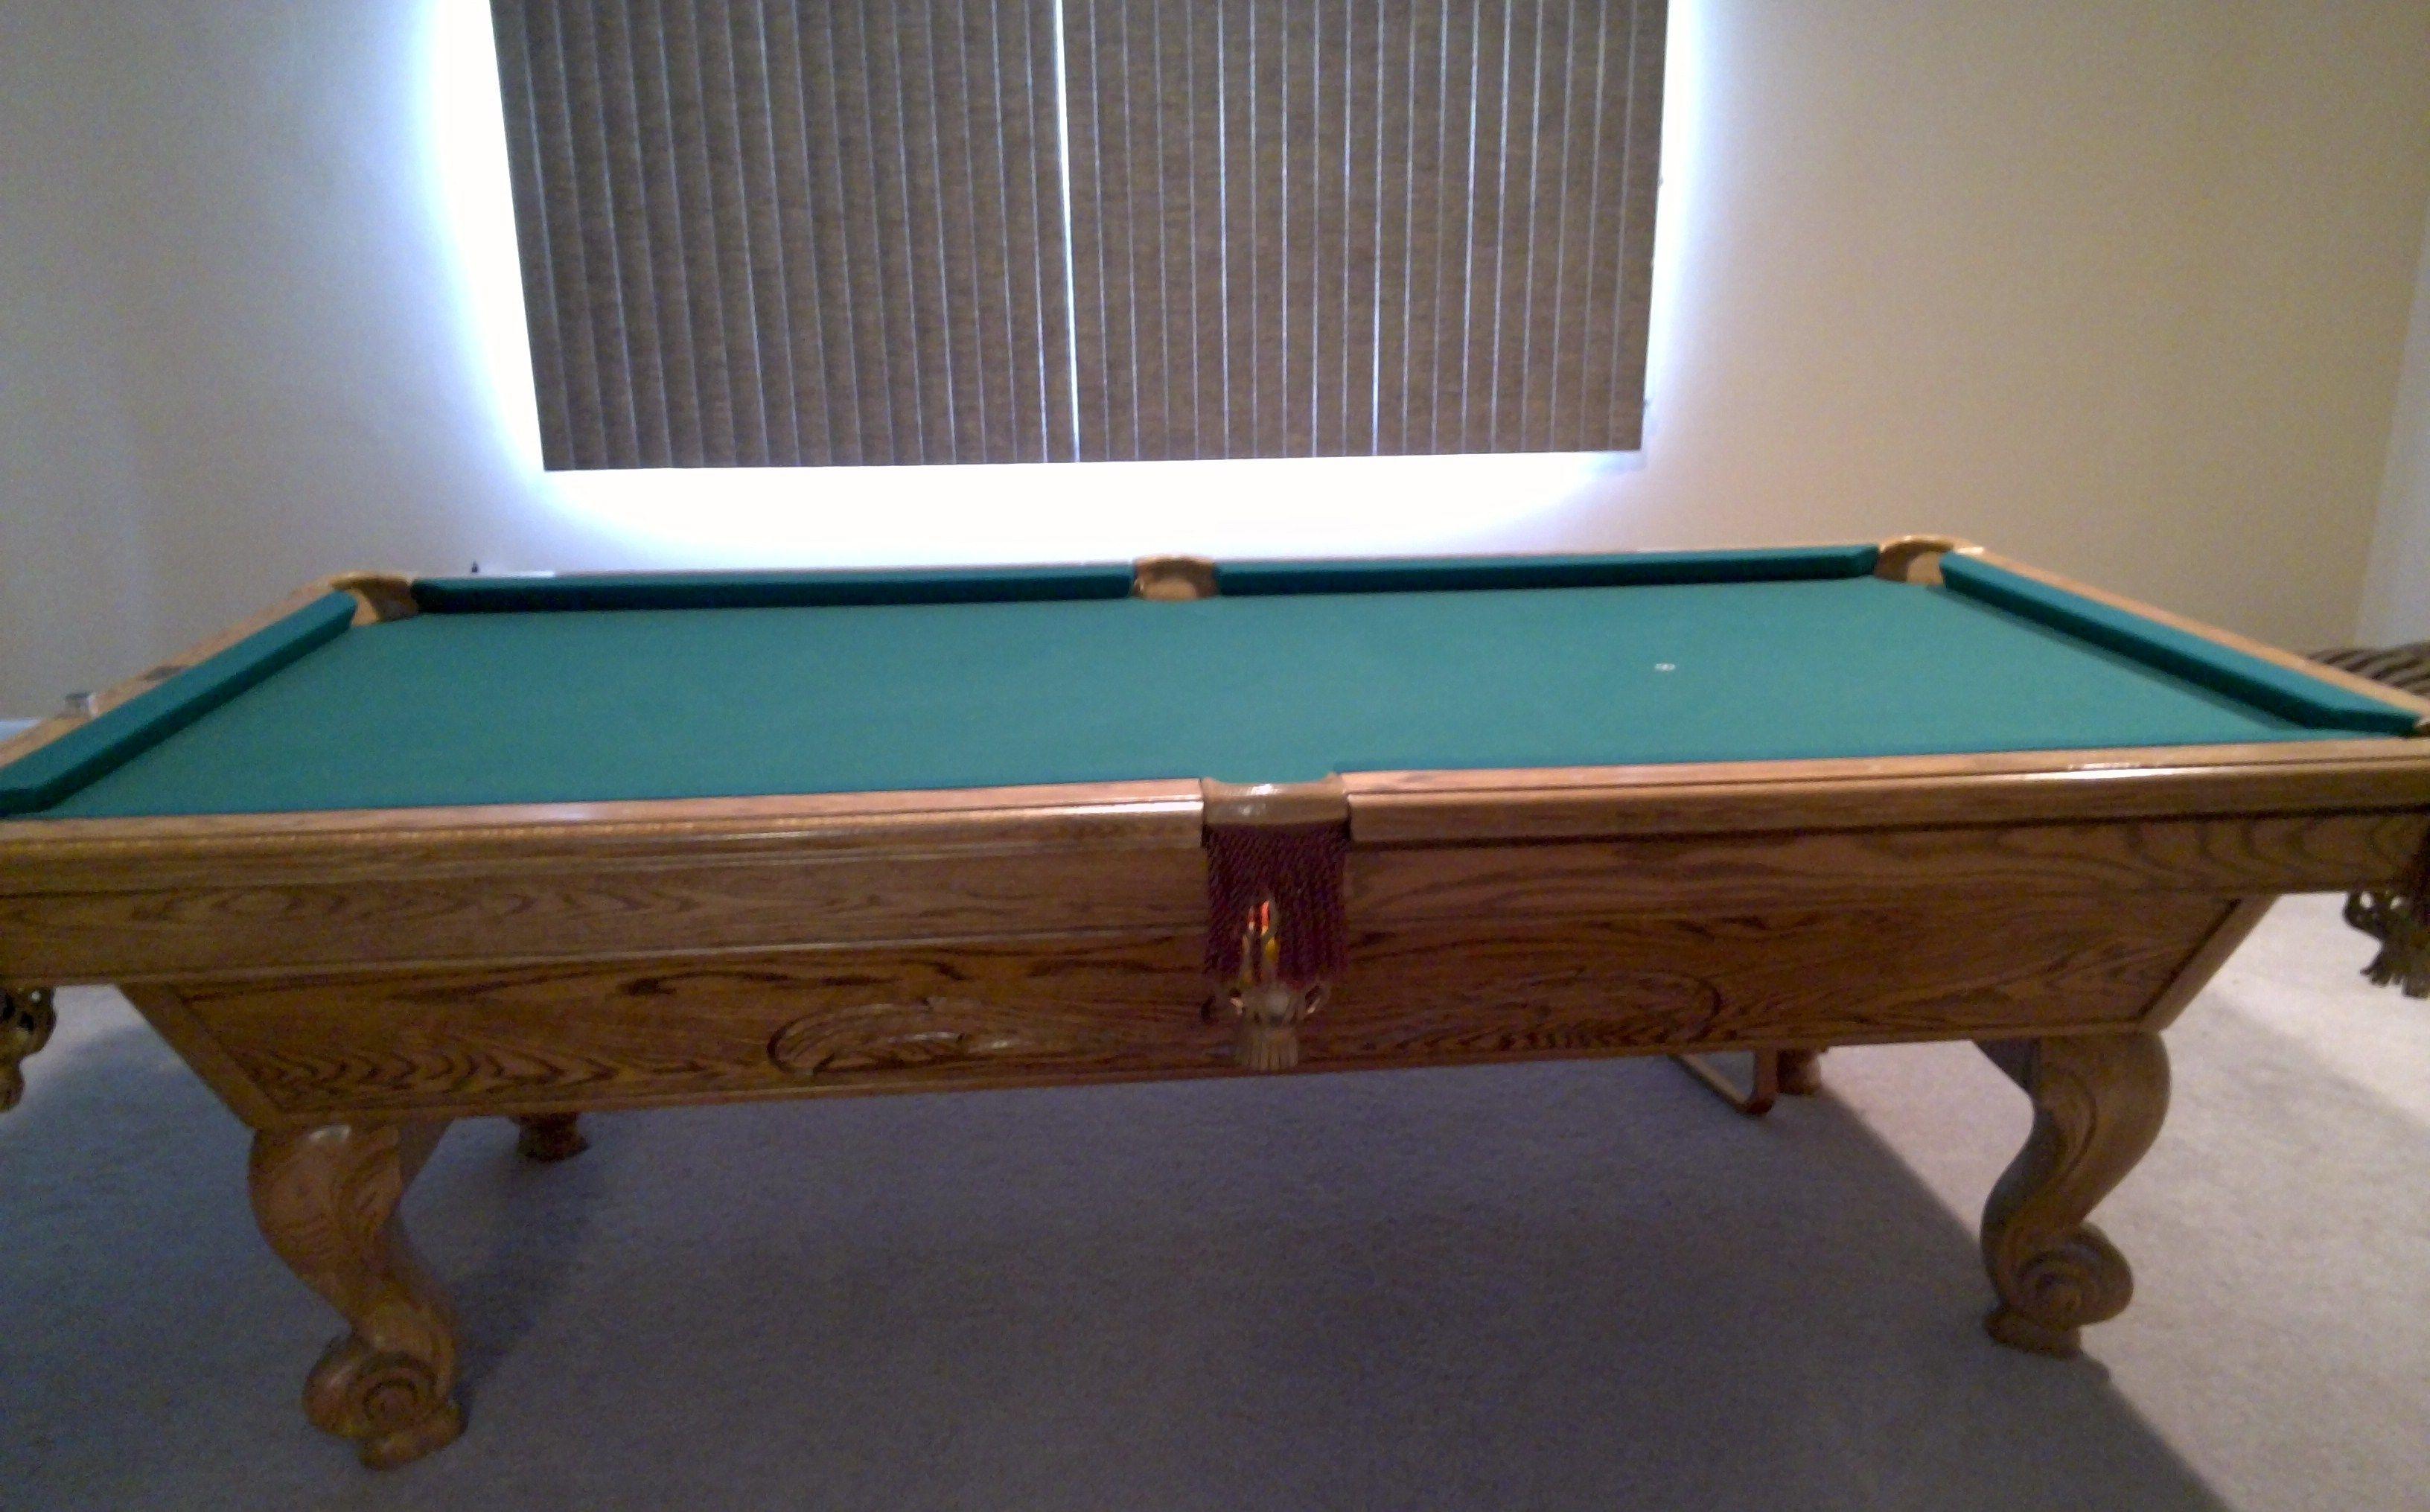 Brunswick Billiards Manchester 8u0027 Solid Wood Pool Table